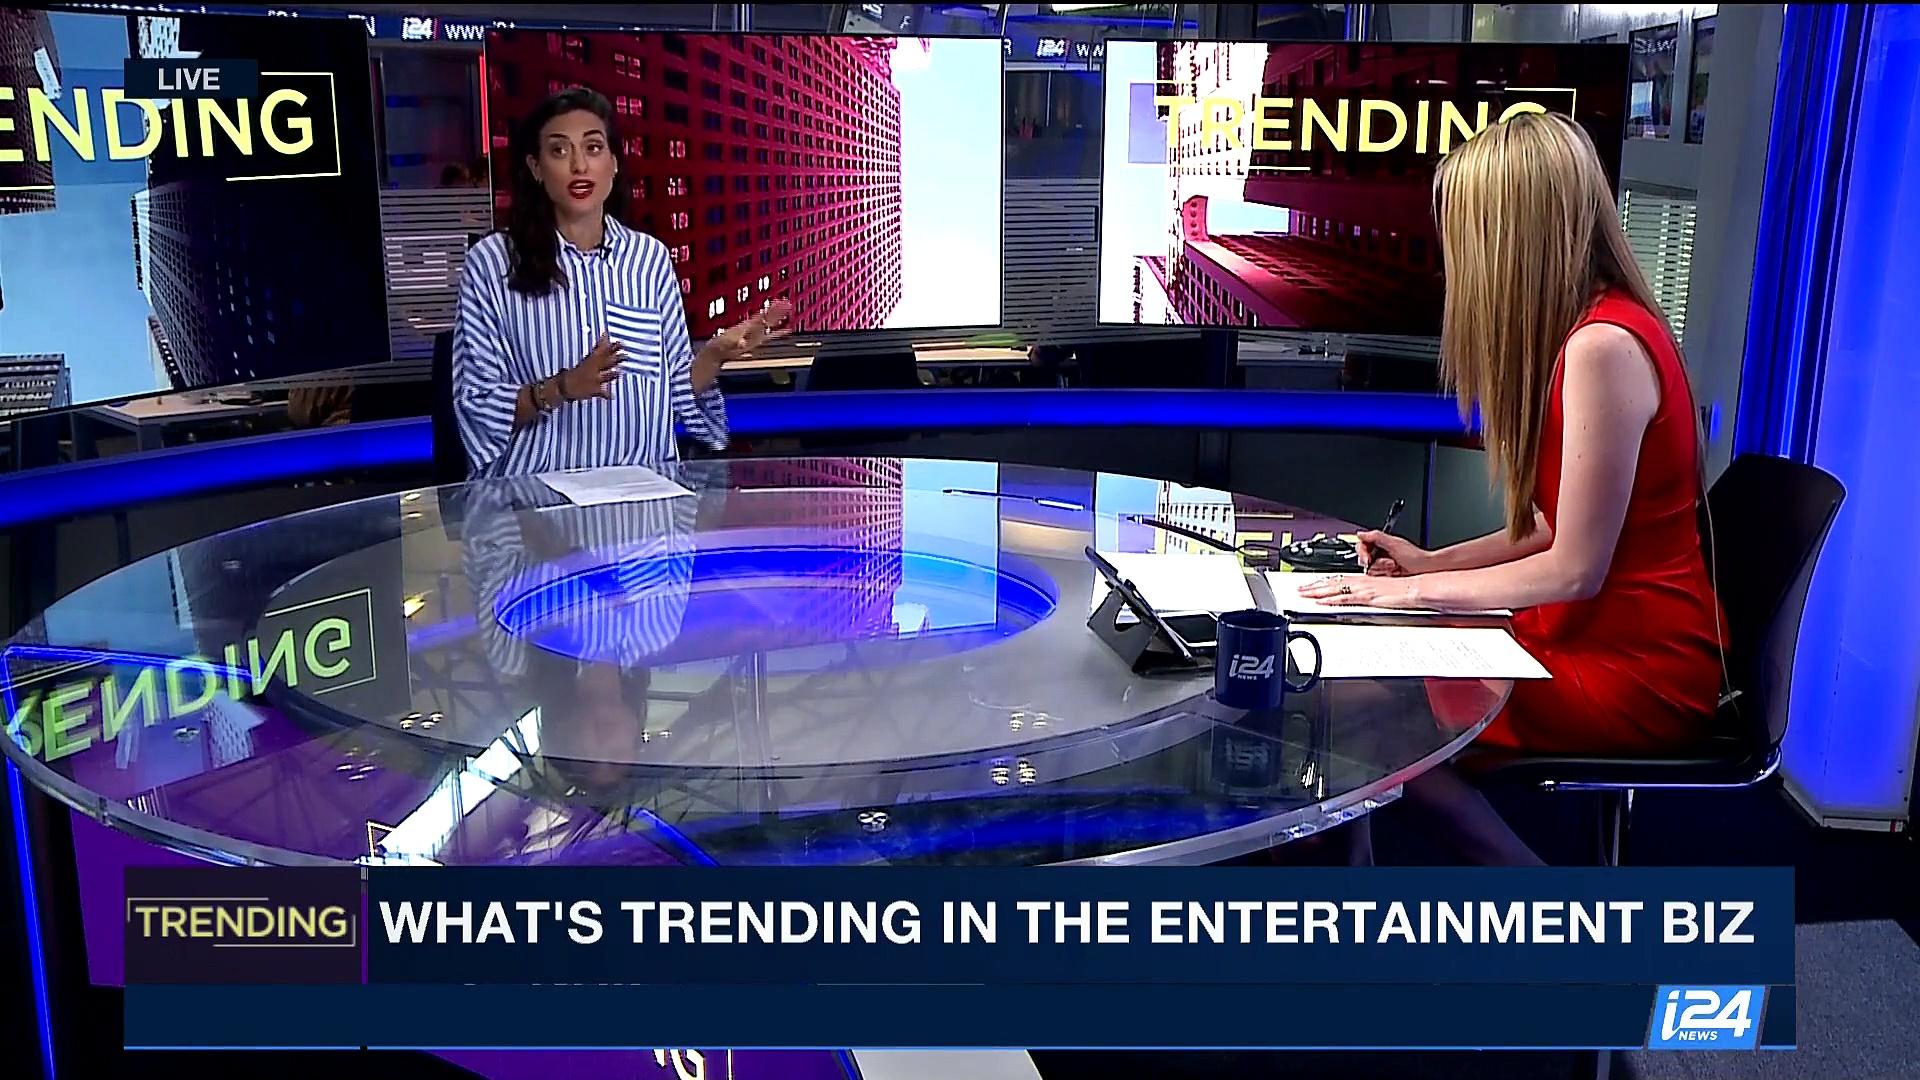 TRENDING | What's trending in the entertainment biz | Thursday, May 11th 2017